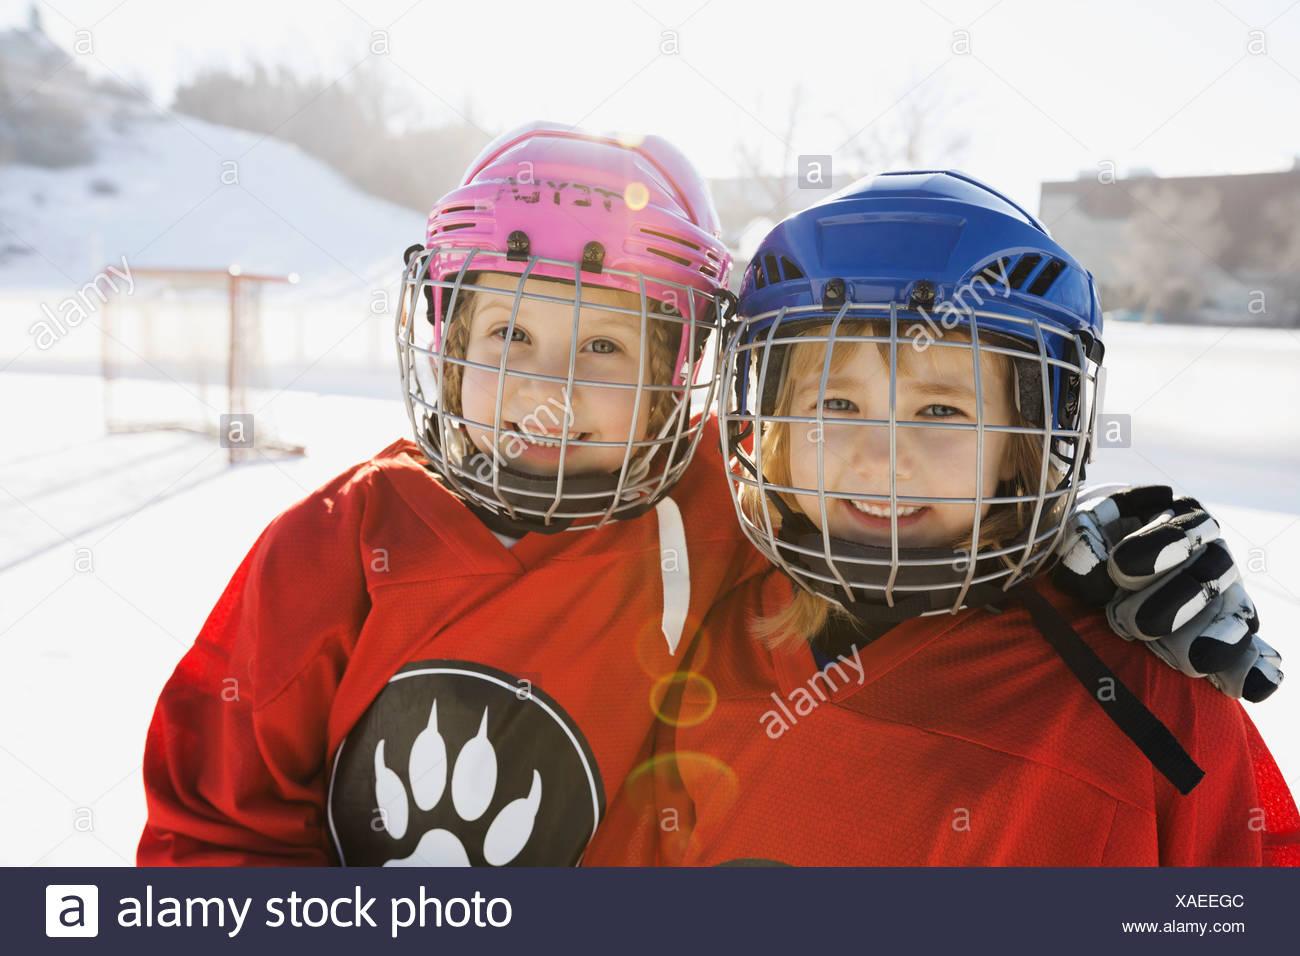 Portrait of smiling girls in ice hockey uniform - Stock Image